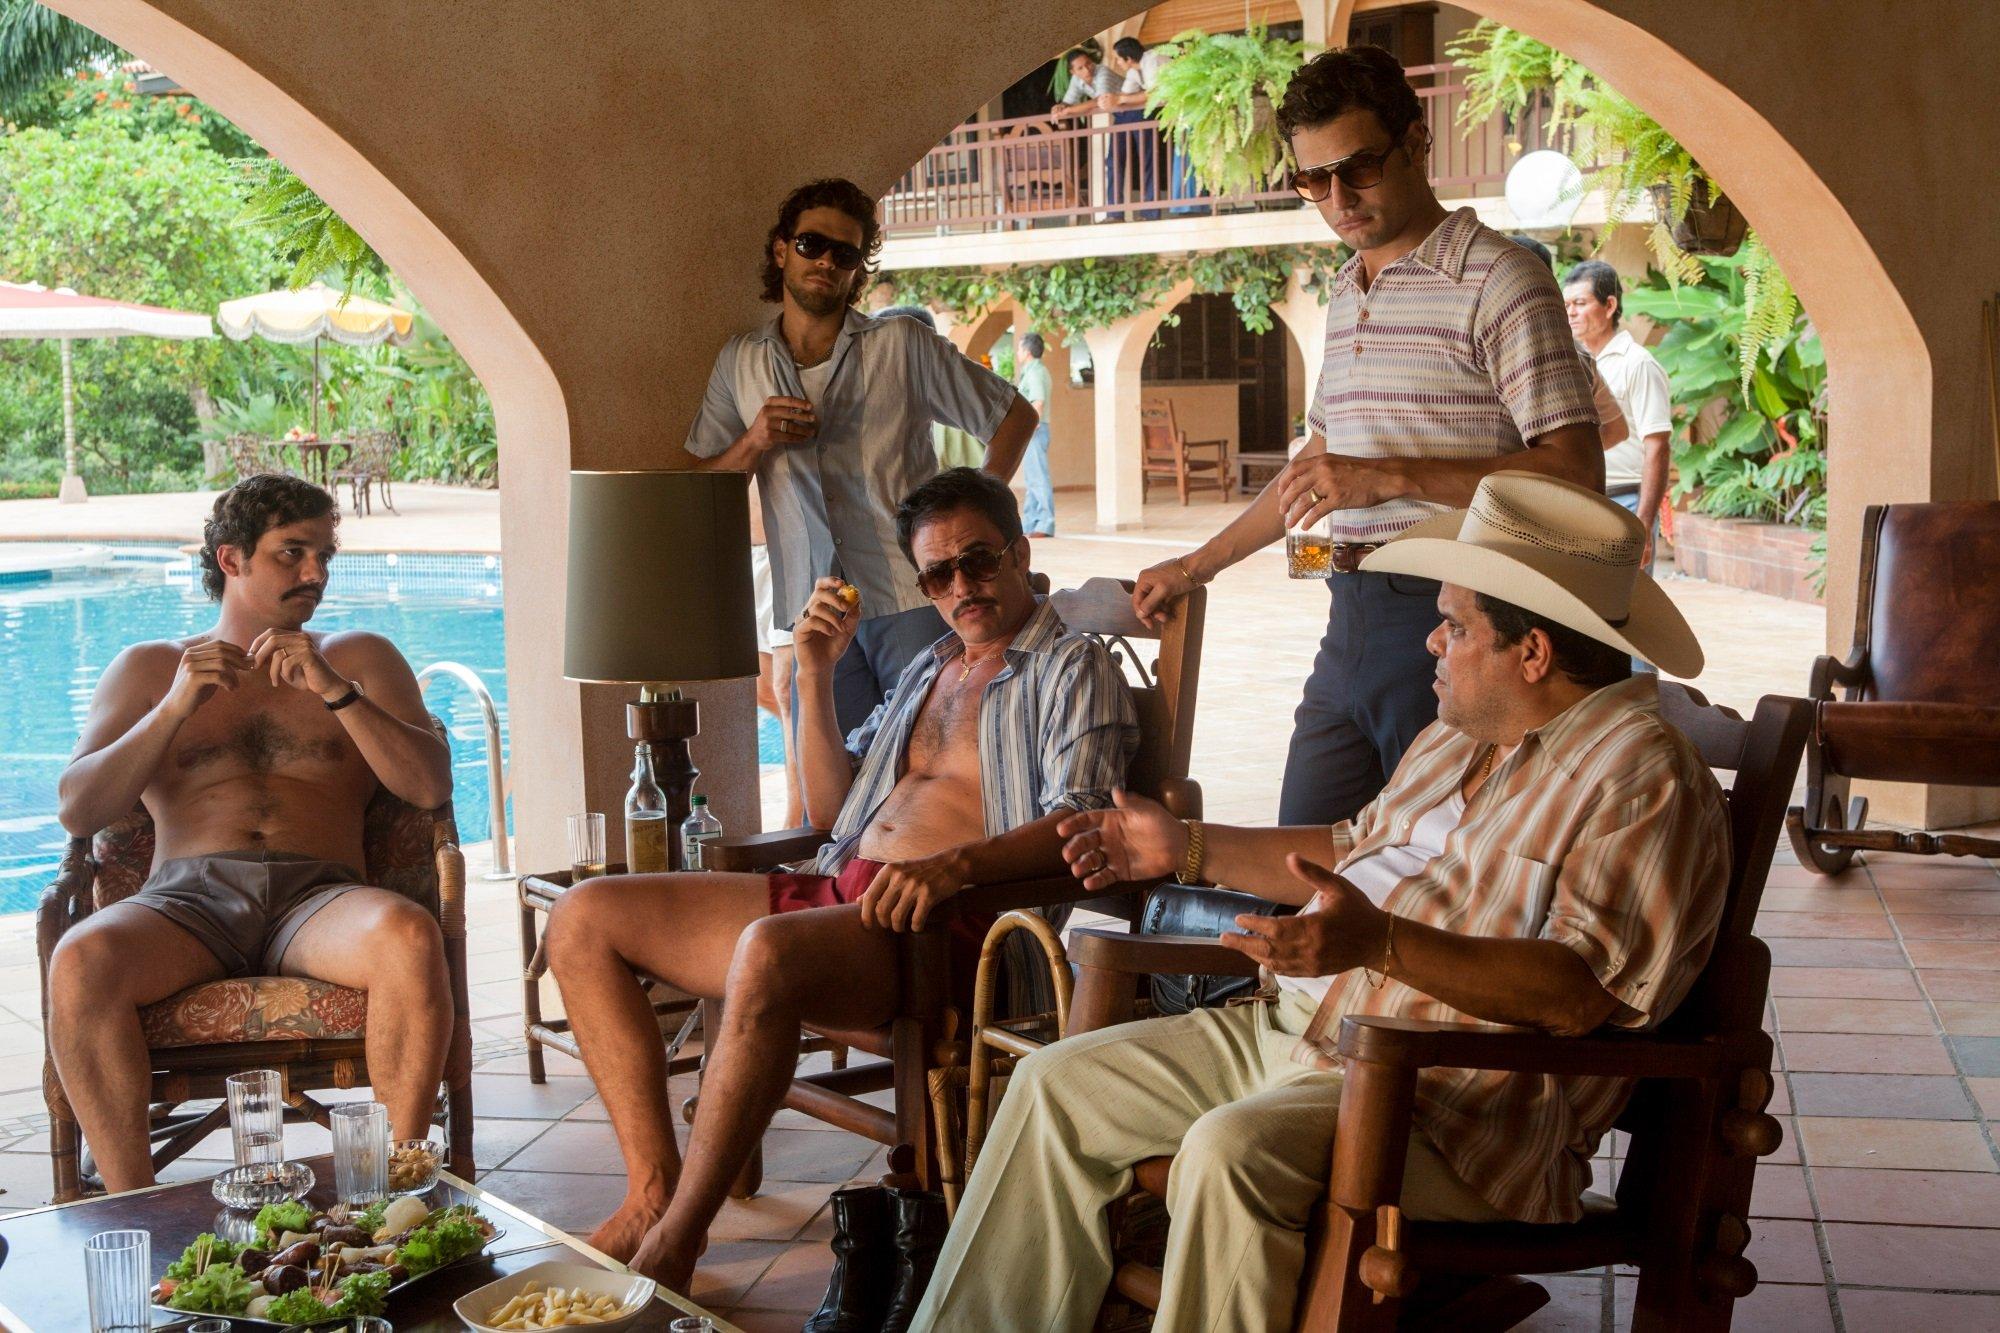 Wagner Moura, Juan Riedinger Juan Pablo Raba, Roberto Urbino and Luis Guzman in 'Narcos'